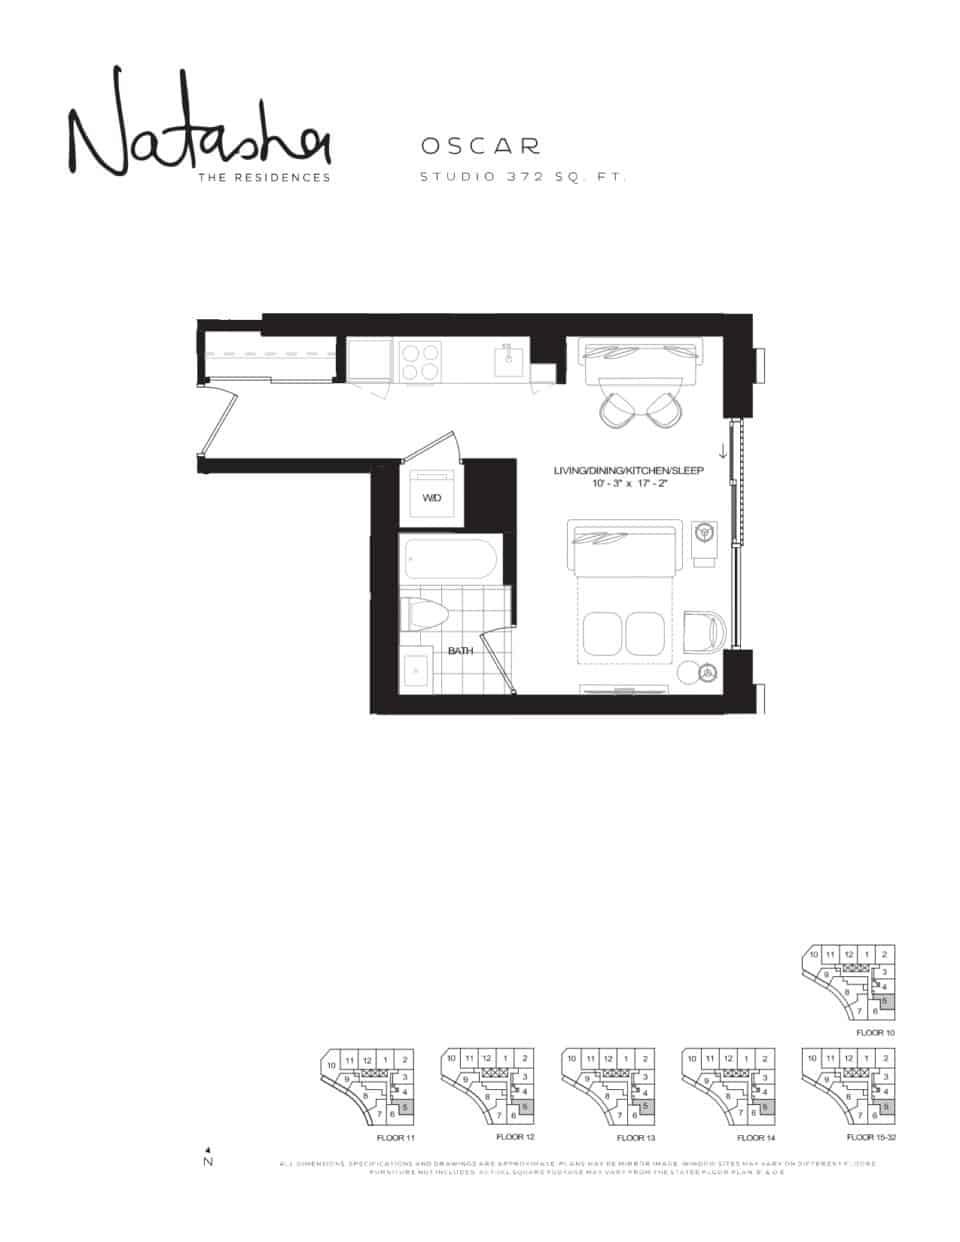 2021 09 02 11 02 48 natashatheresidences lanterradevelopments floorplans oscar